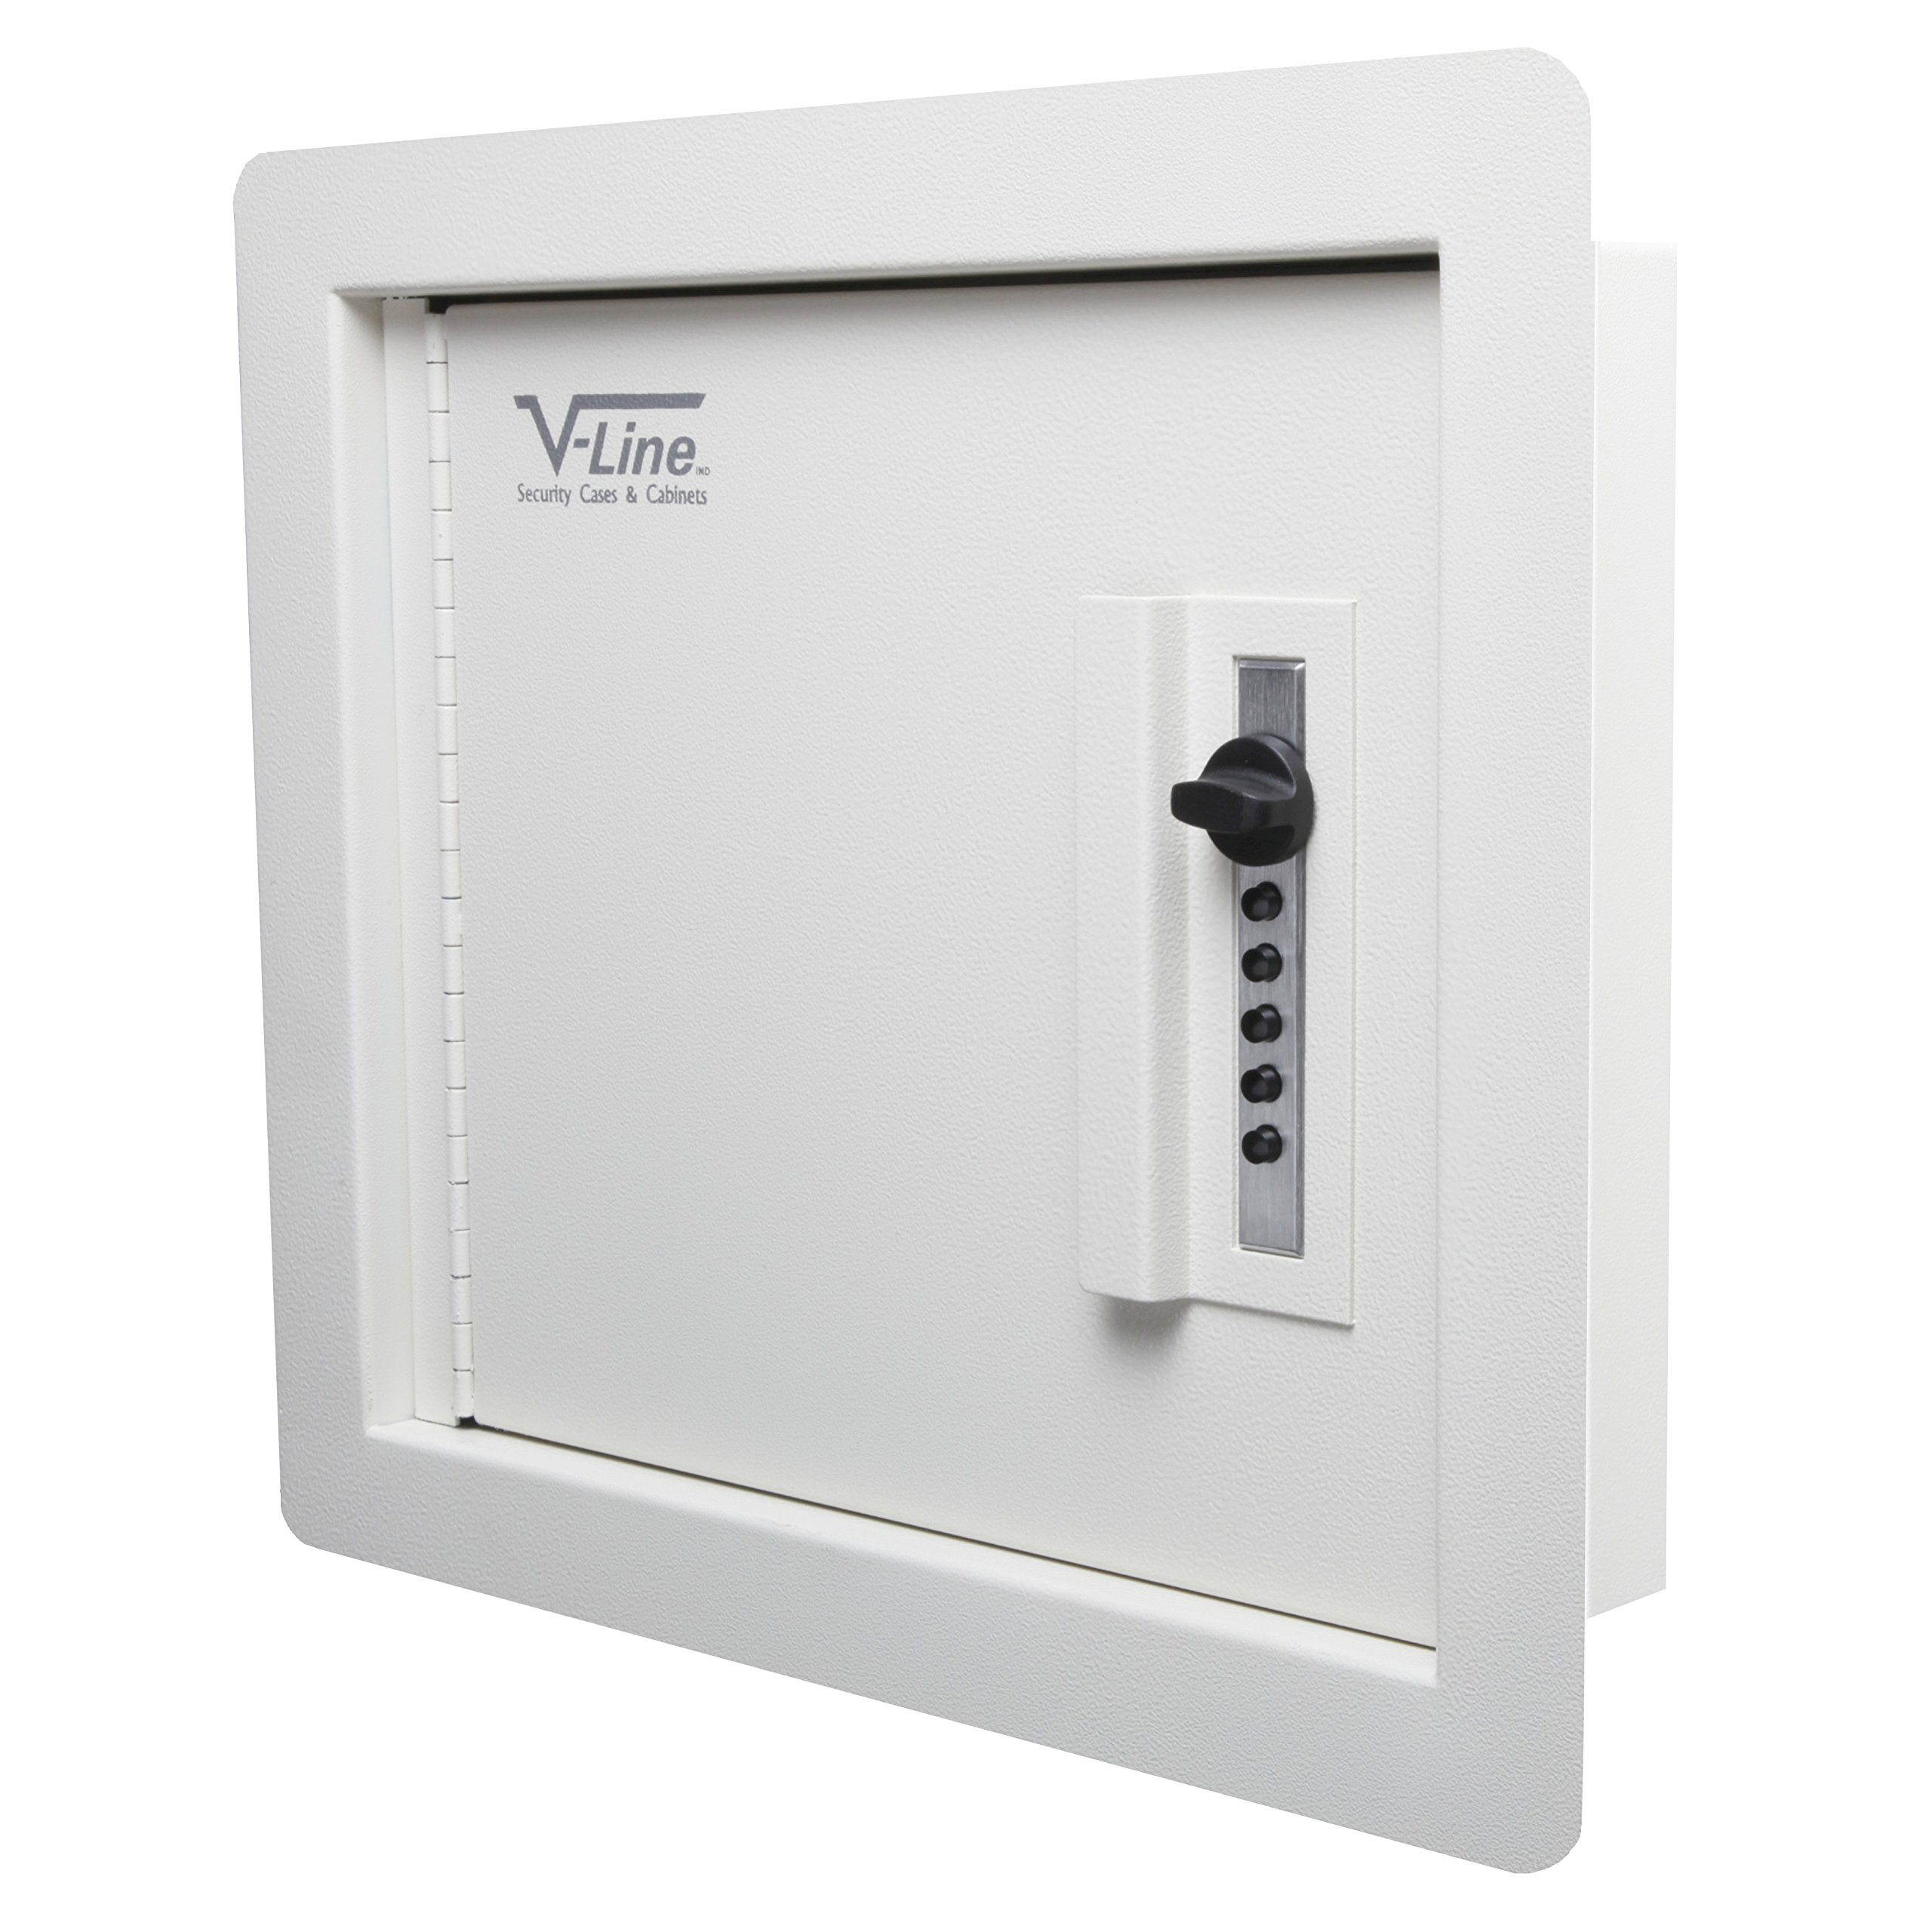 V Line Quick Locking Storage Valuables